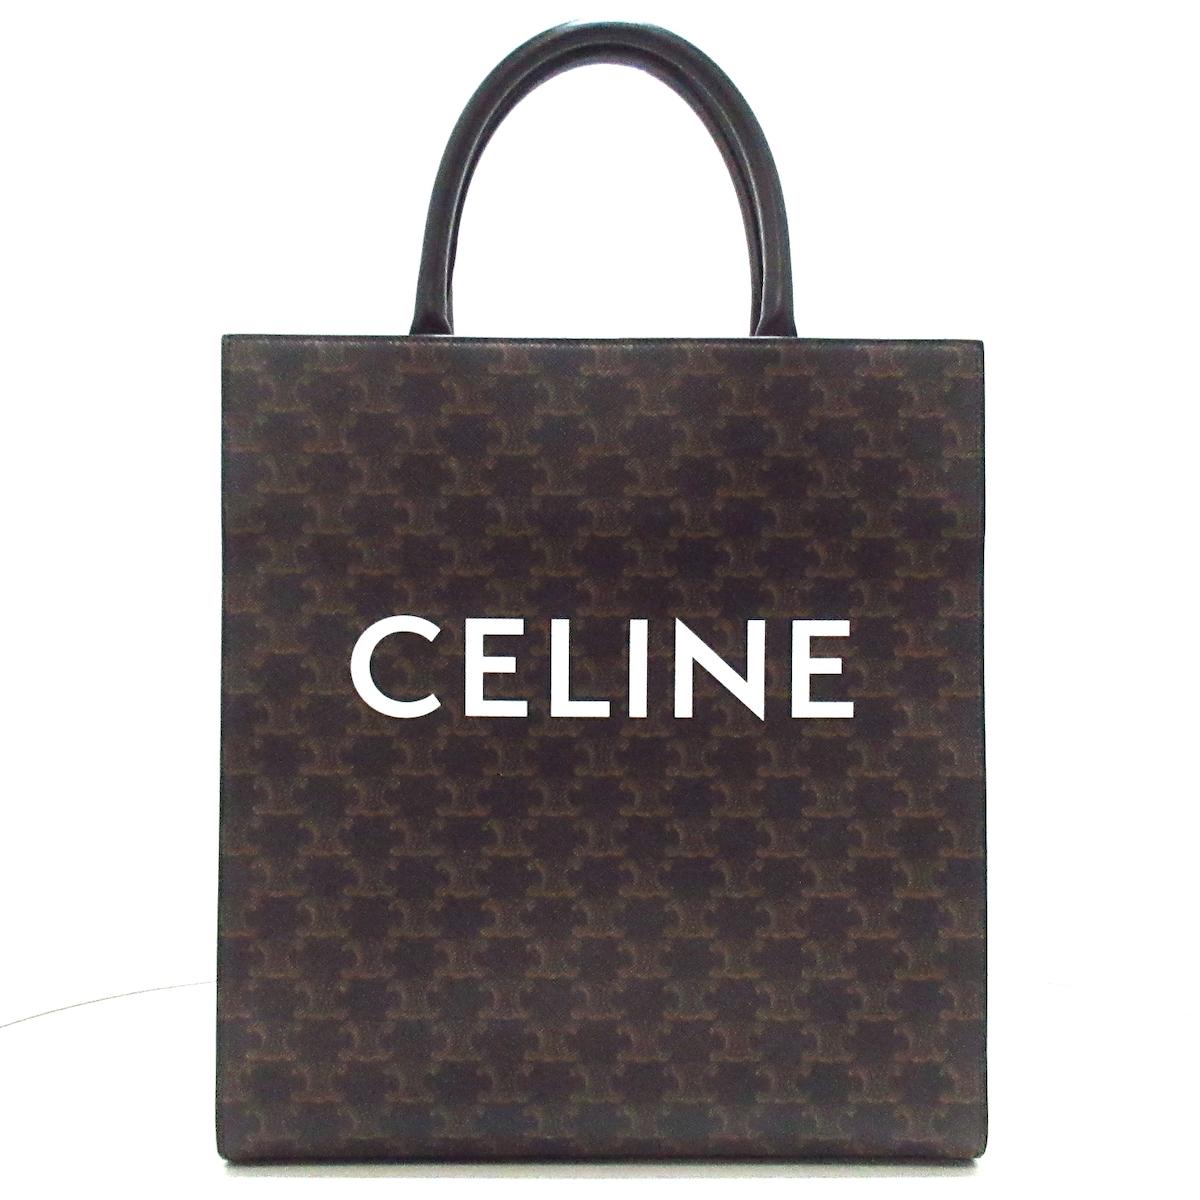 CELINE(セリーヌ)のミディアム バーティカル カバ